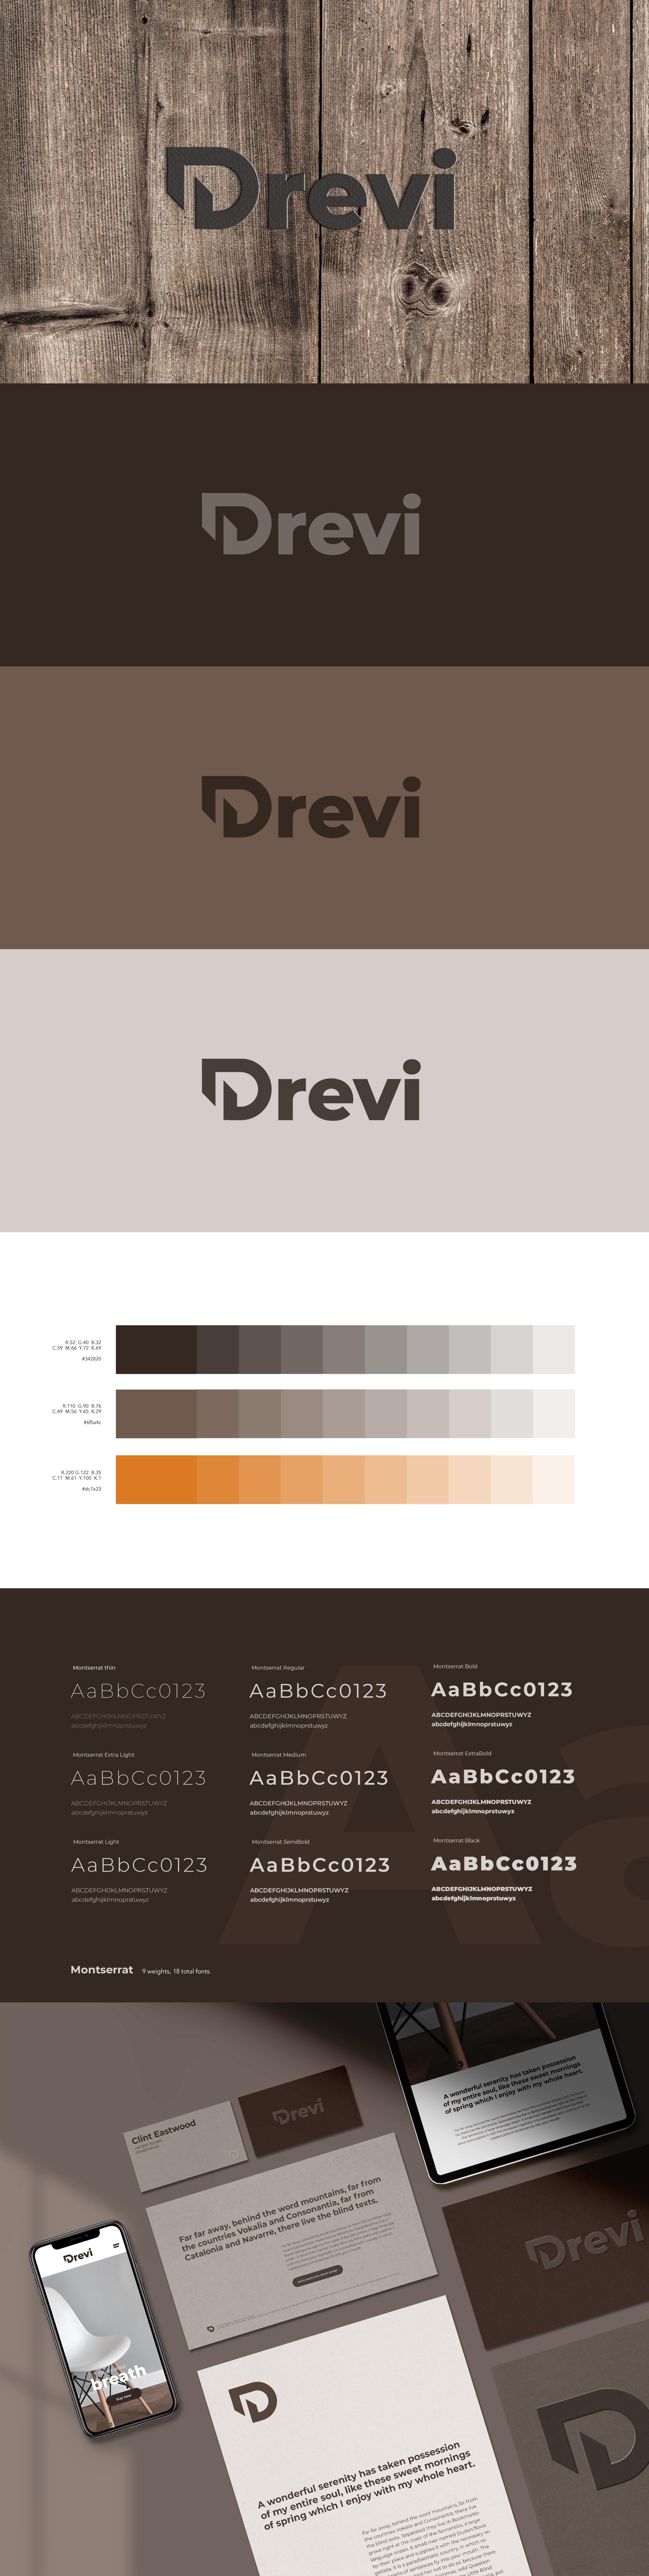 drevi_id_presentation